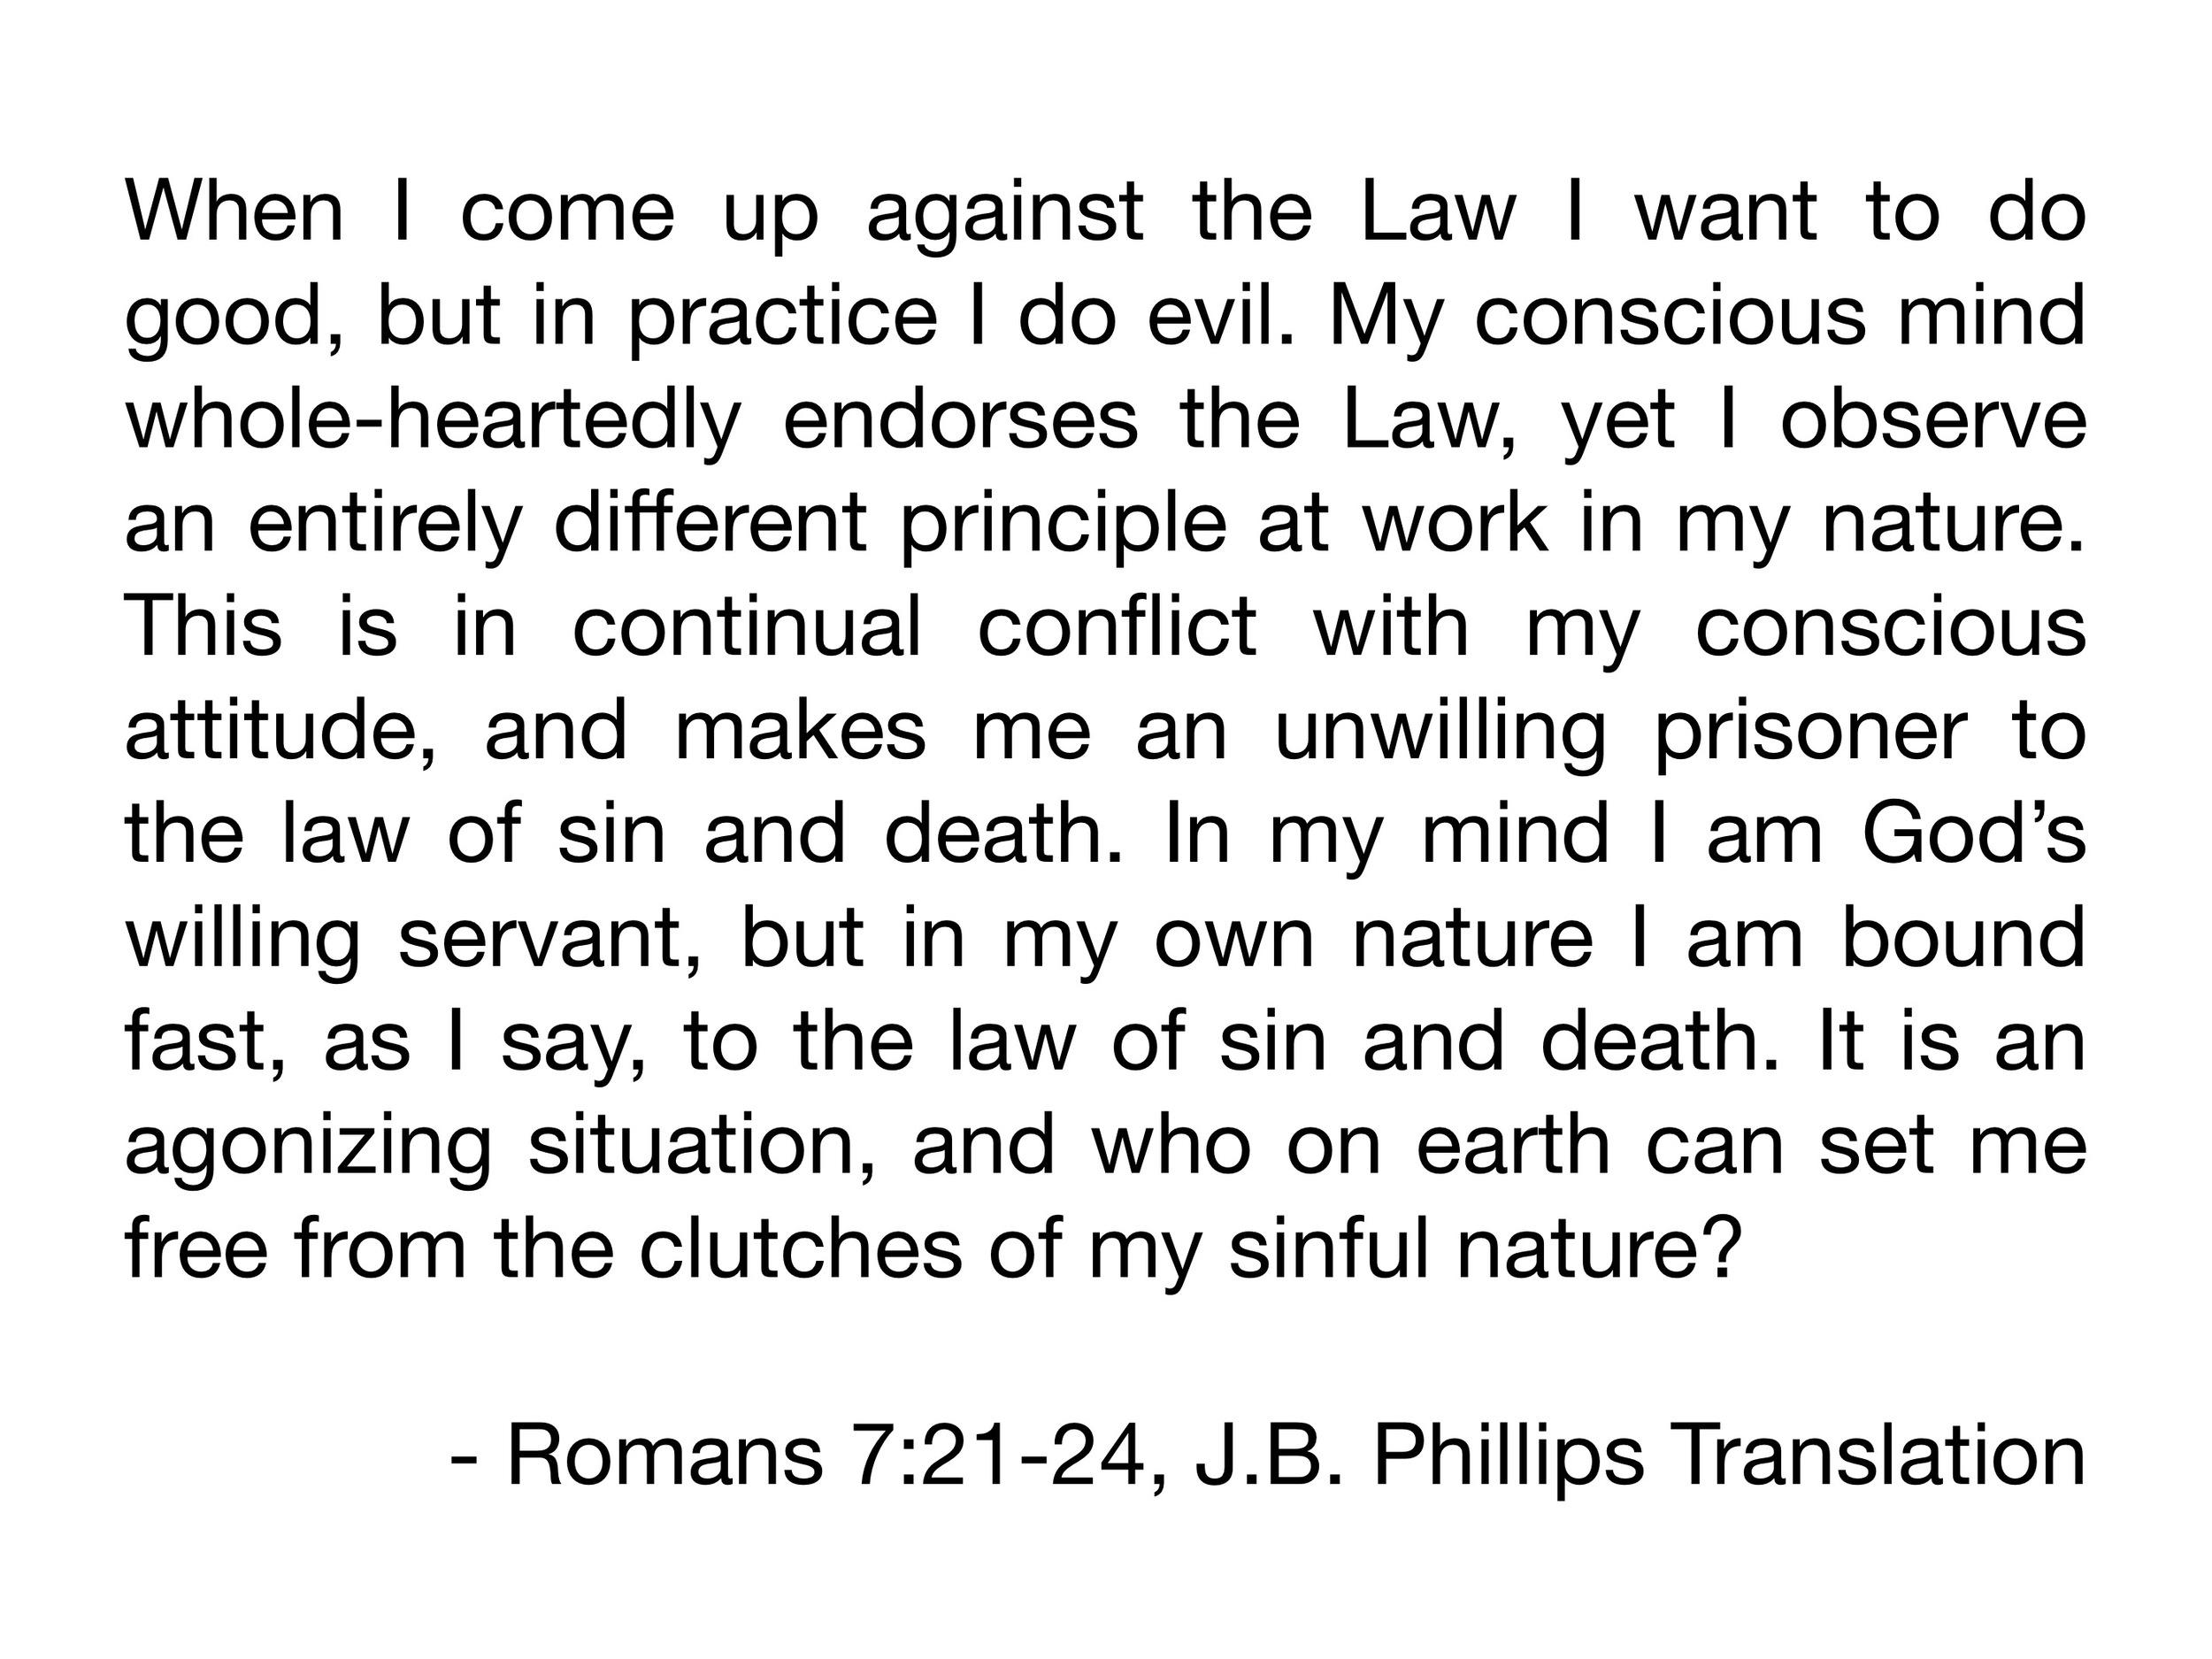 Romans 7:15-25 Sildes-1 5-5.jpeg